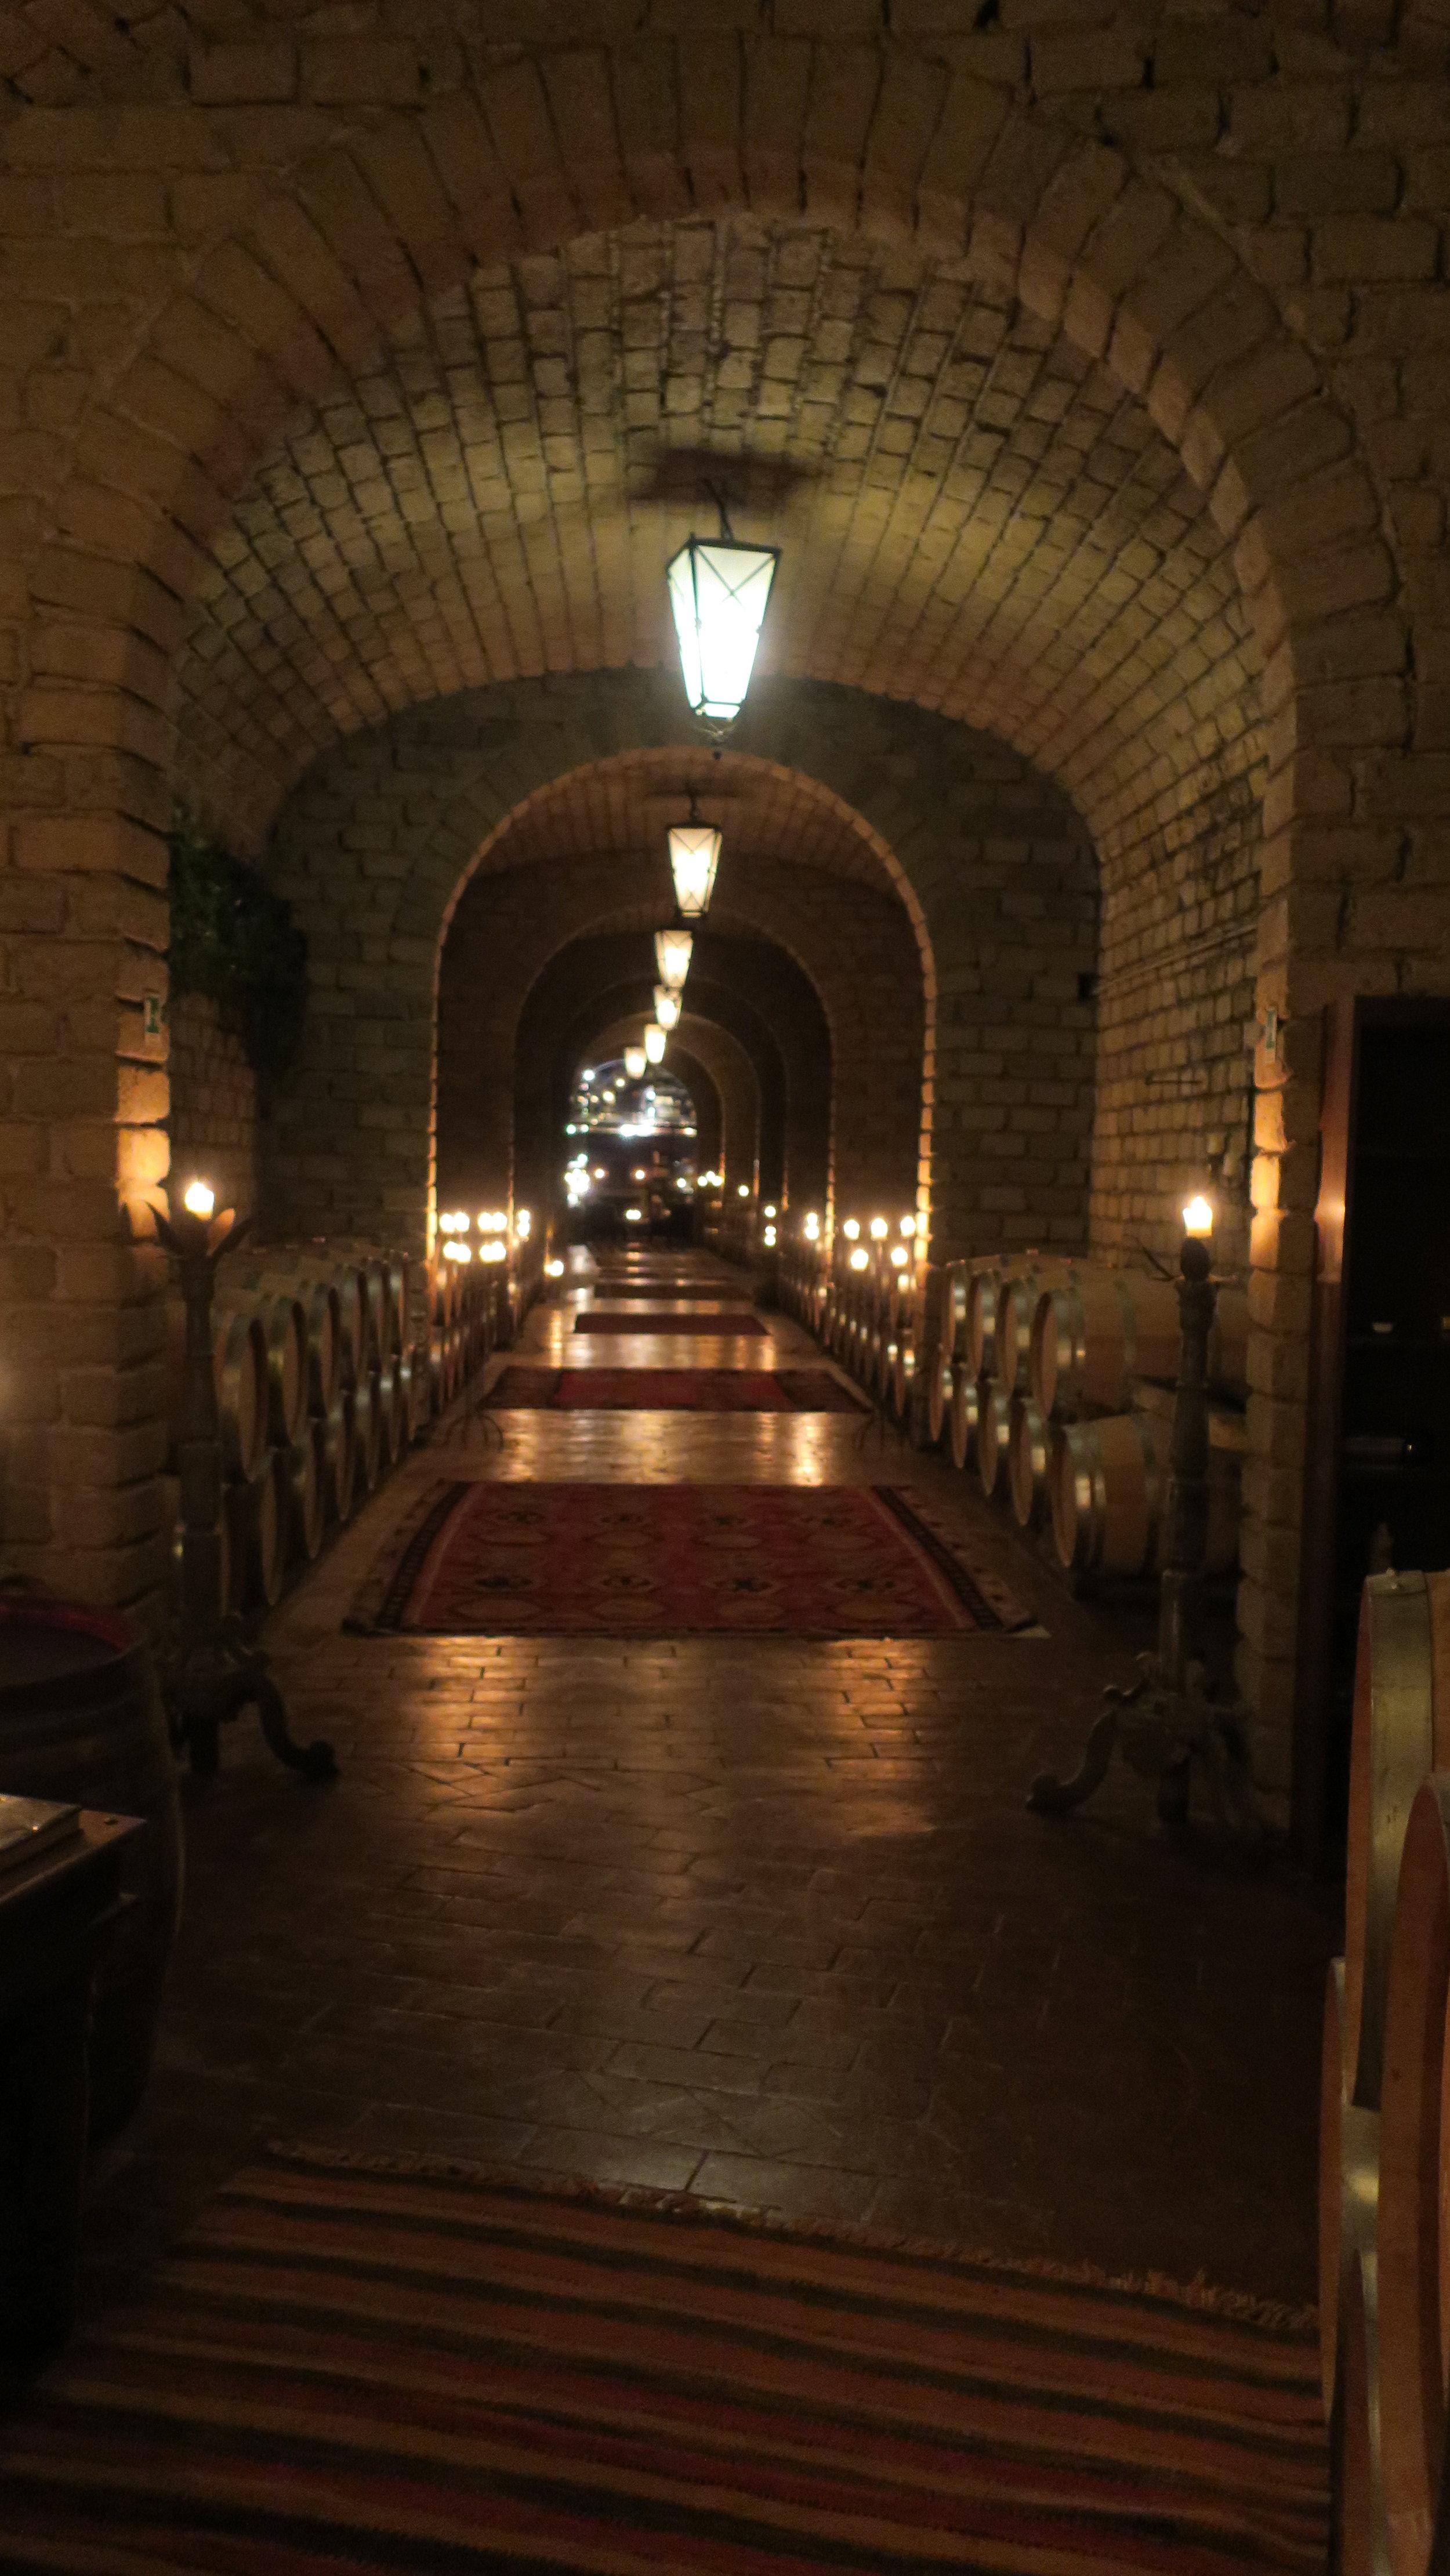 Wine cellar designed by Luca Brasini (Photo credit: Sumilier)